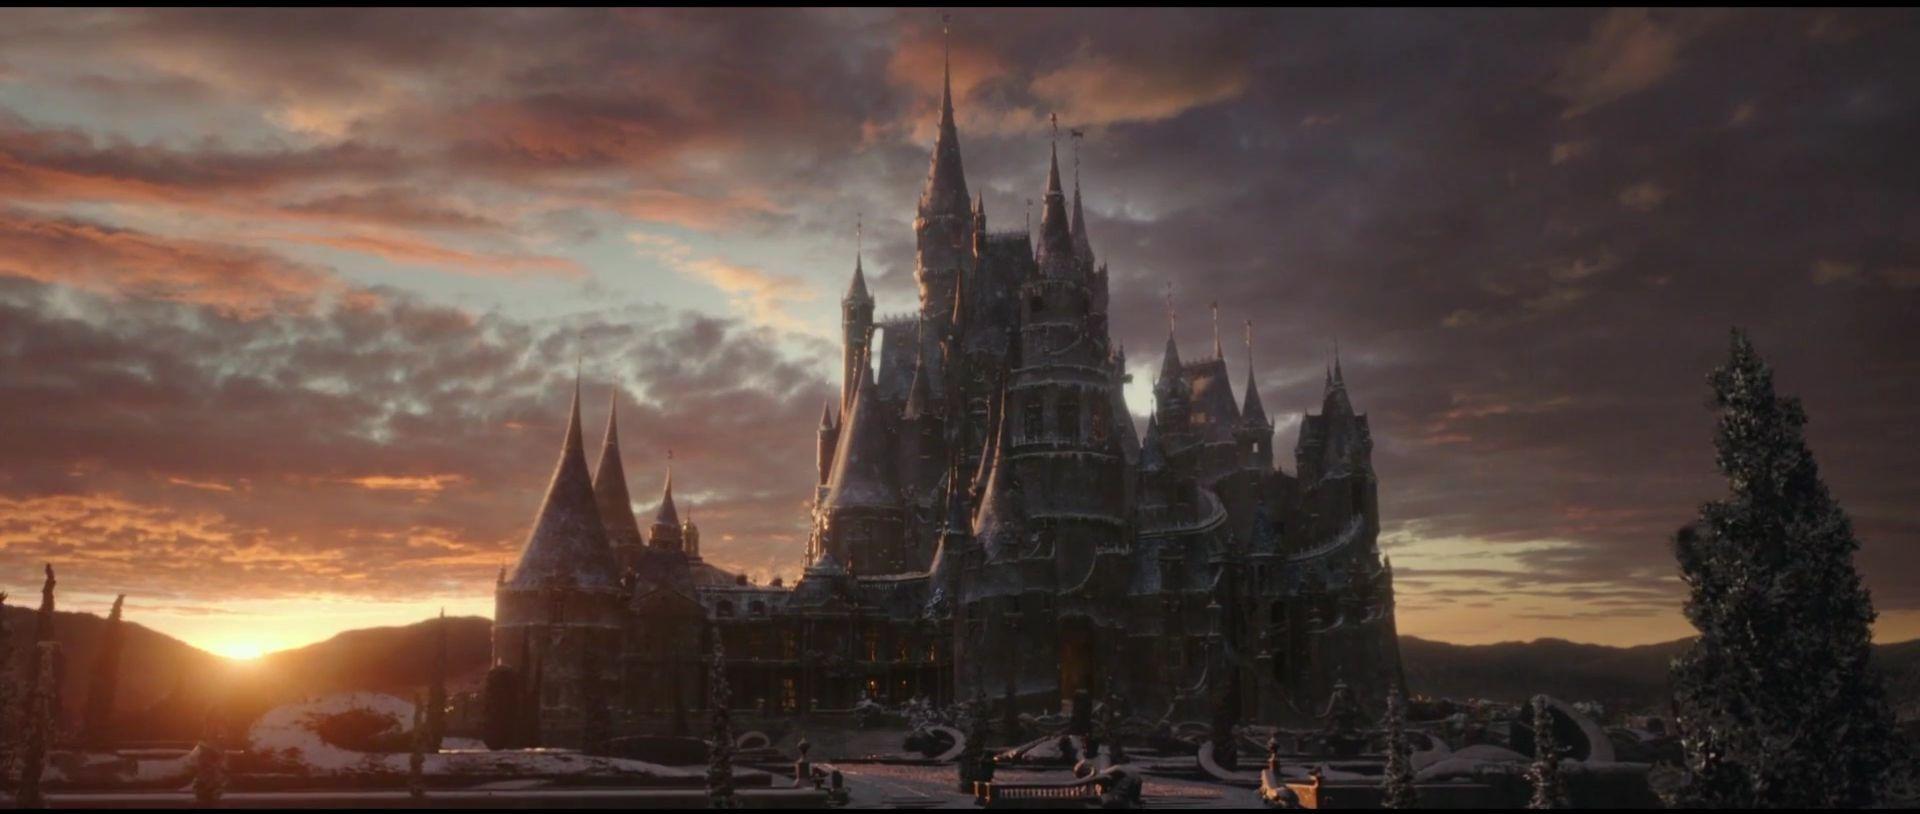 The Castle  Beauty And The Beast 2017 Movie Wiki  Fandom-2201